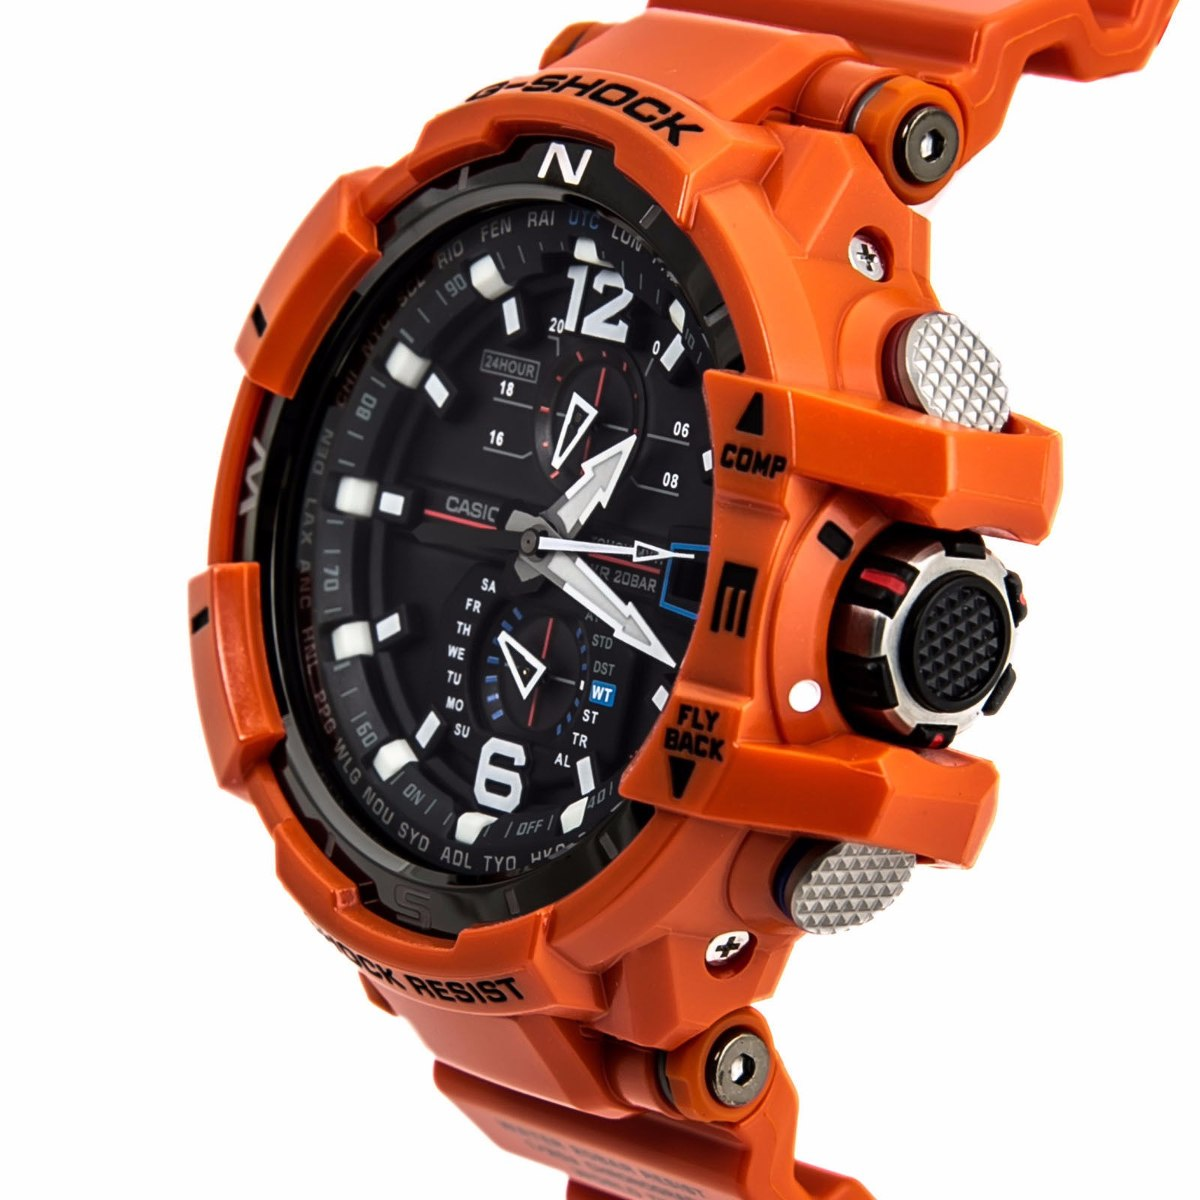 d948b395da2 relógio masculino casio g-shock gravity defier gw-a1100-1a3. Carregando  zoom.